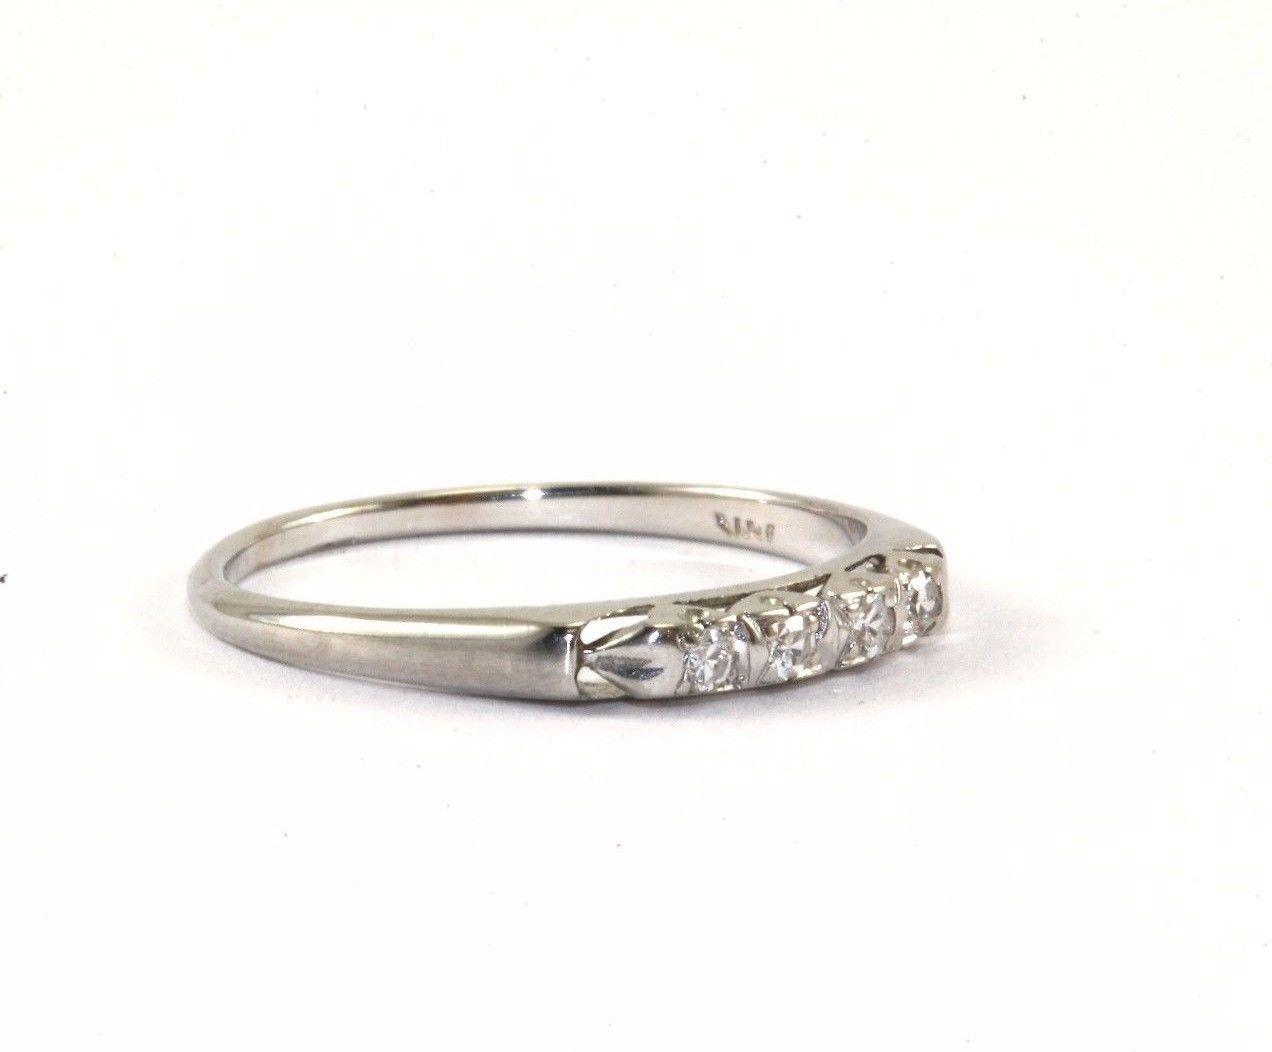 thin wedding bands 14K WHITE GOLD FOUR NATURAL DIAMONDS THIN WEDDING BAND RING GRG 84